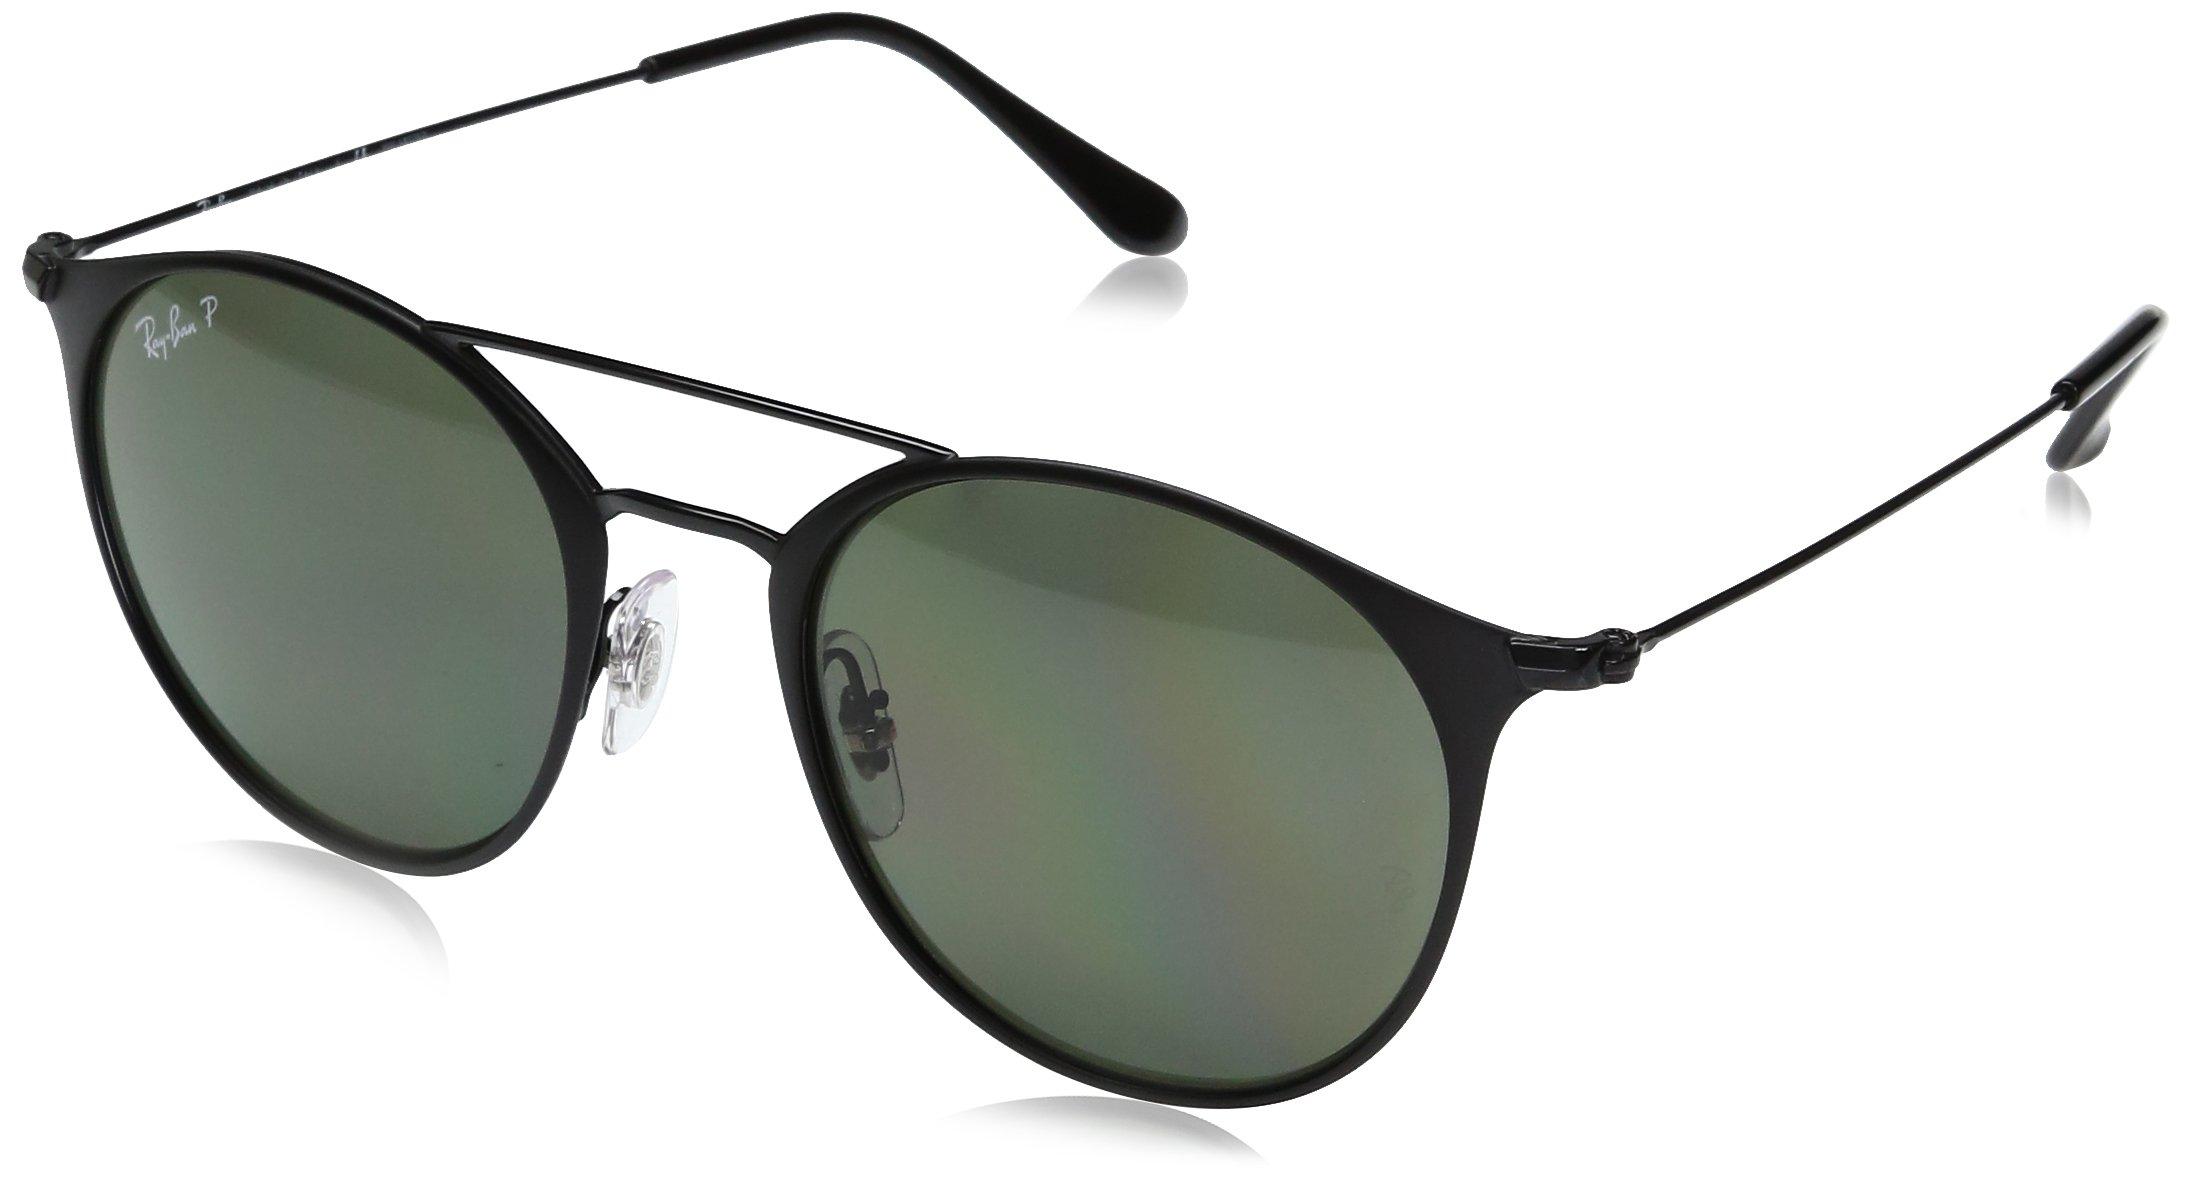 Ray-Ban Steel Unisex Polarized Round Sunglasses, Black Top Matte Black, 52 mm